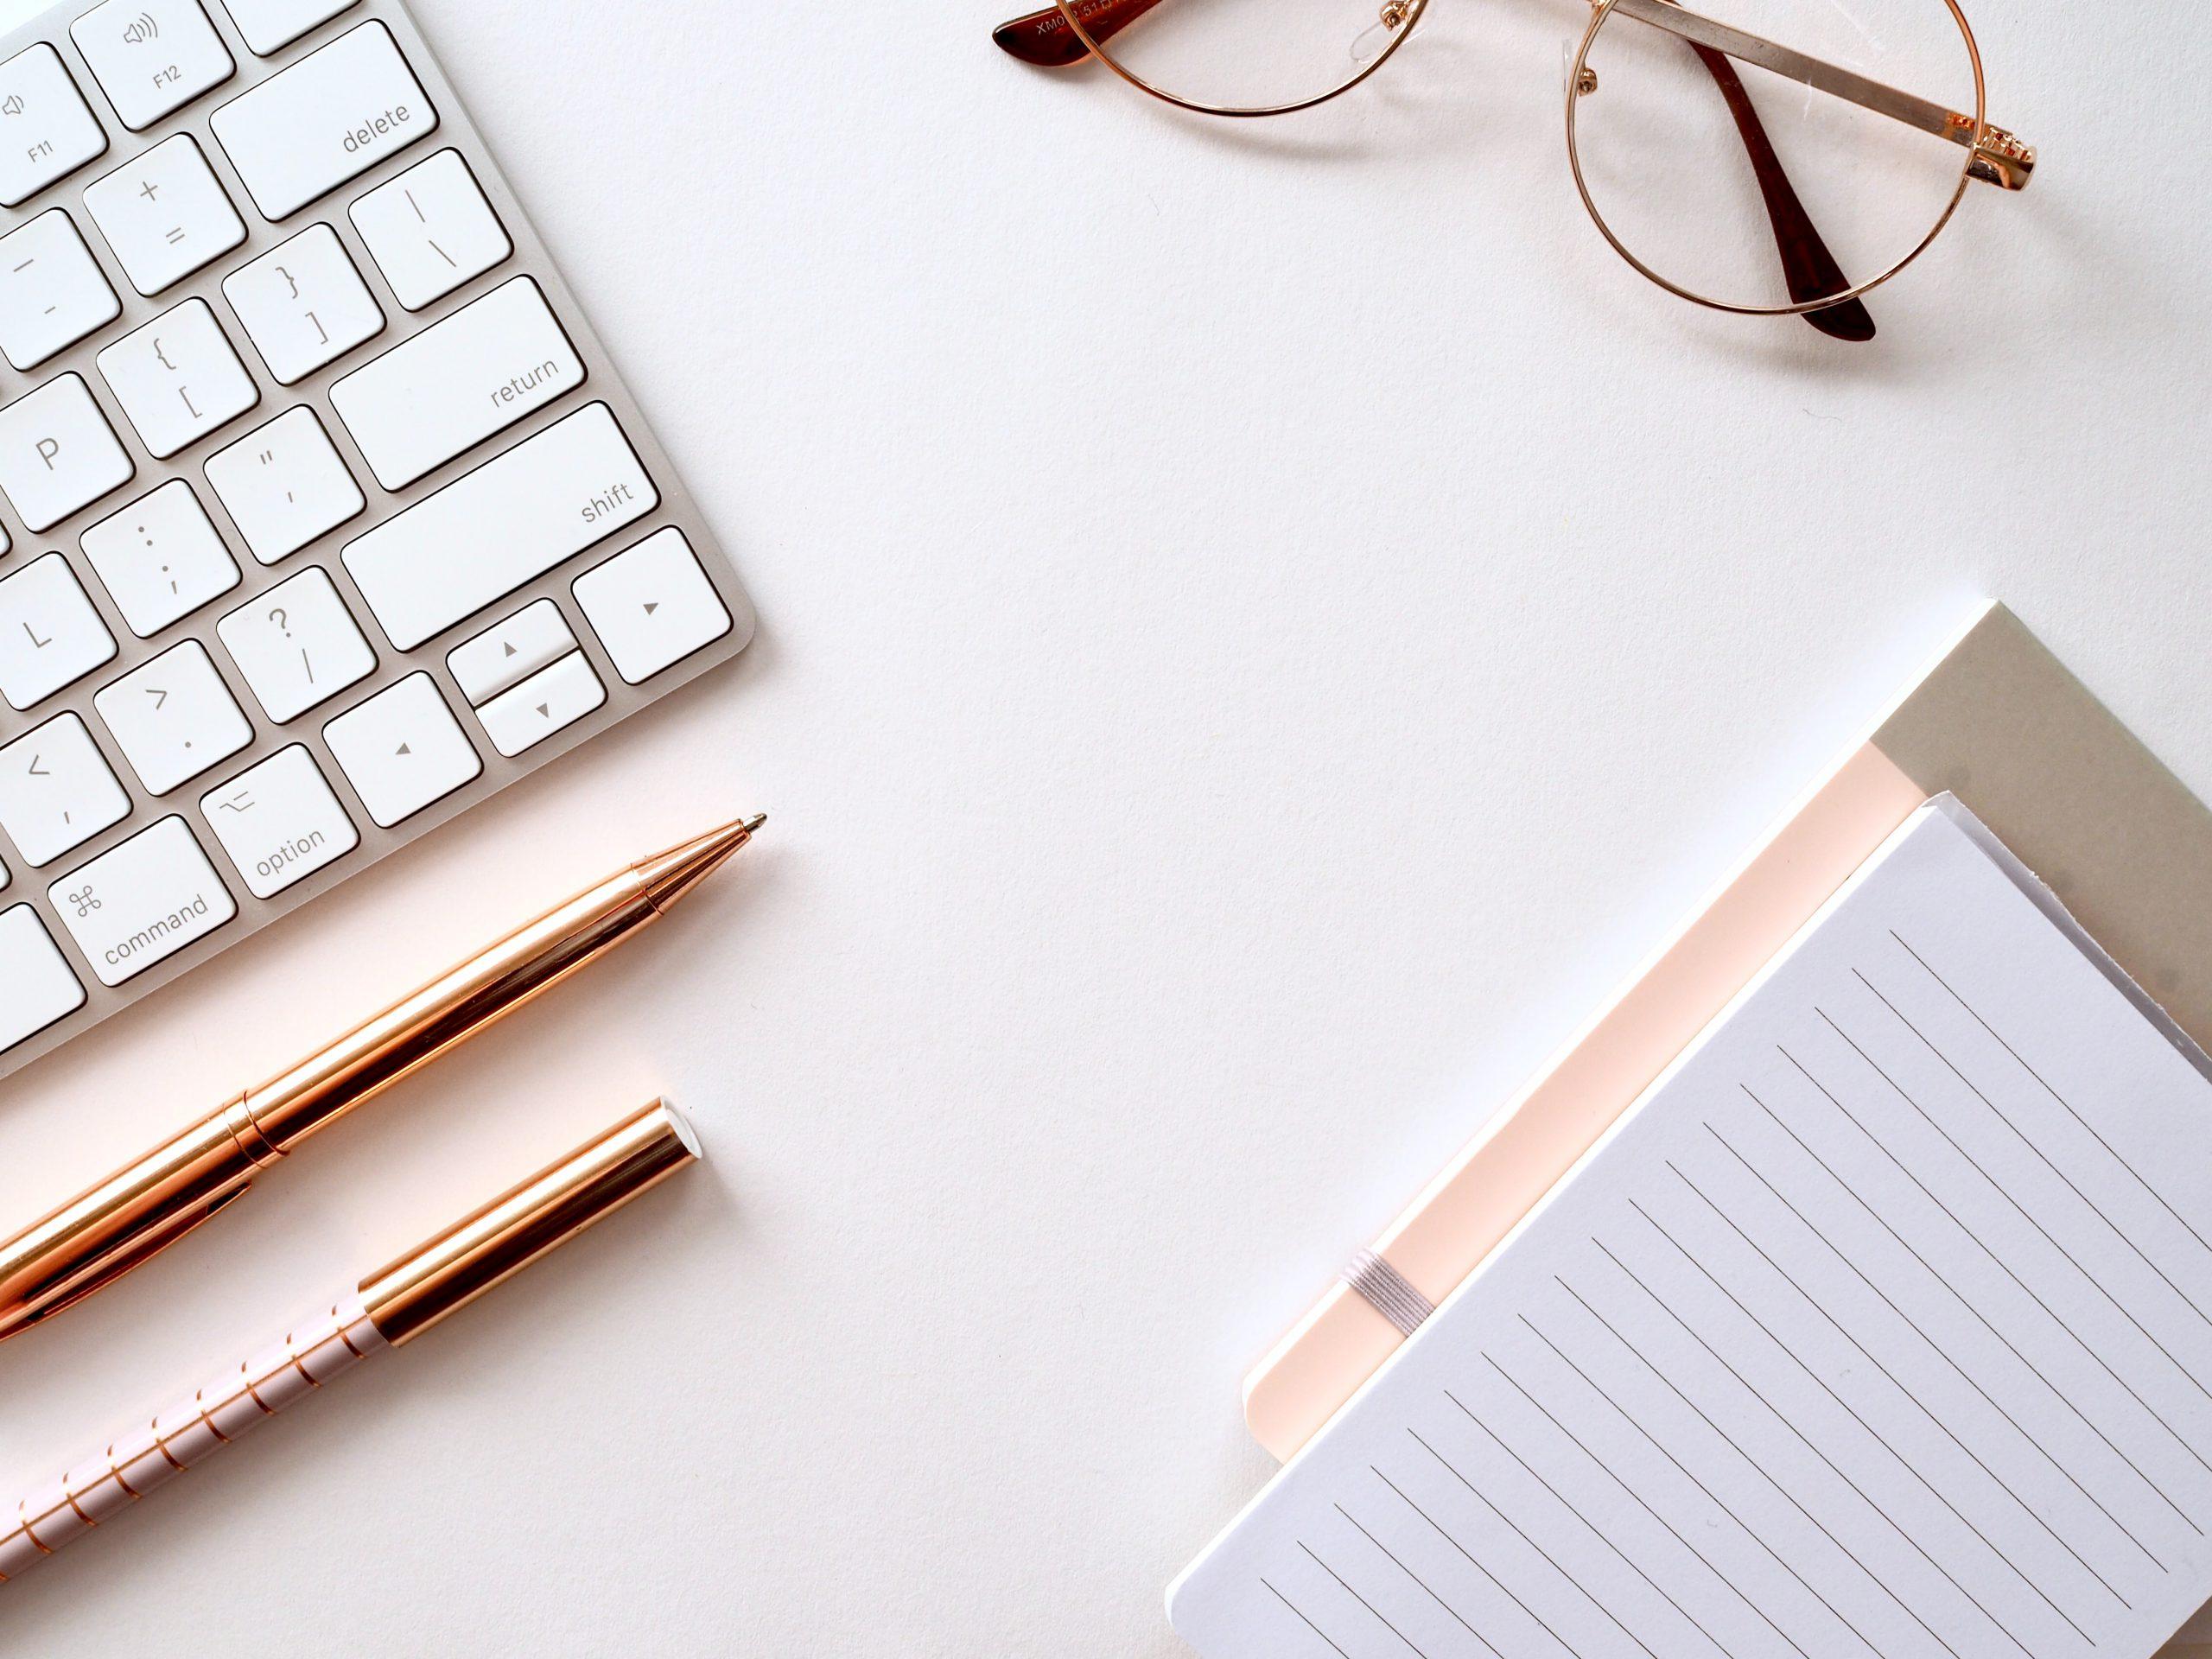 Writing materials stock